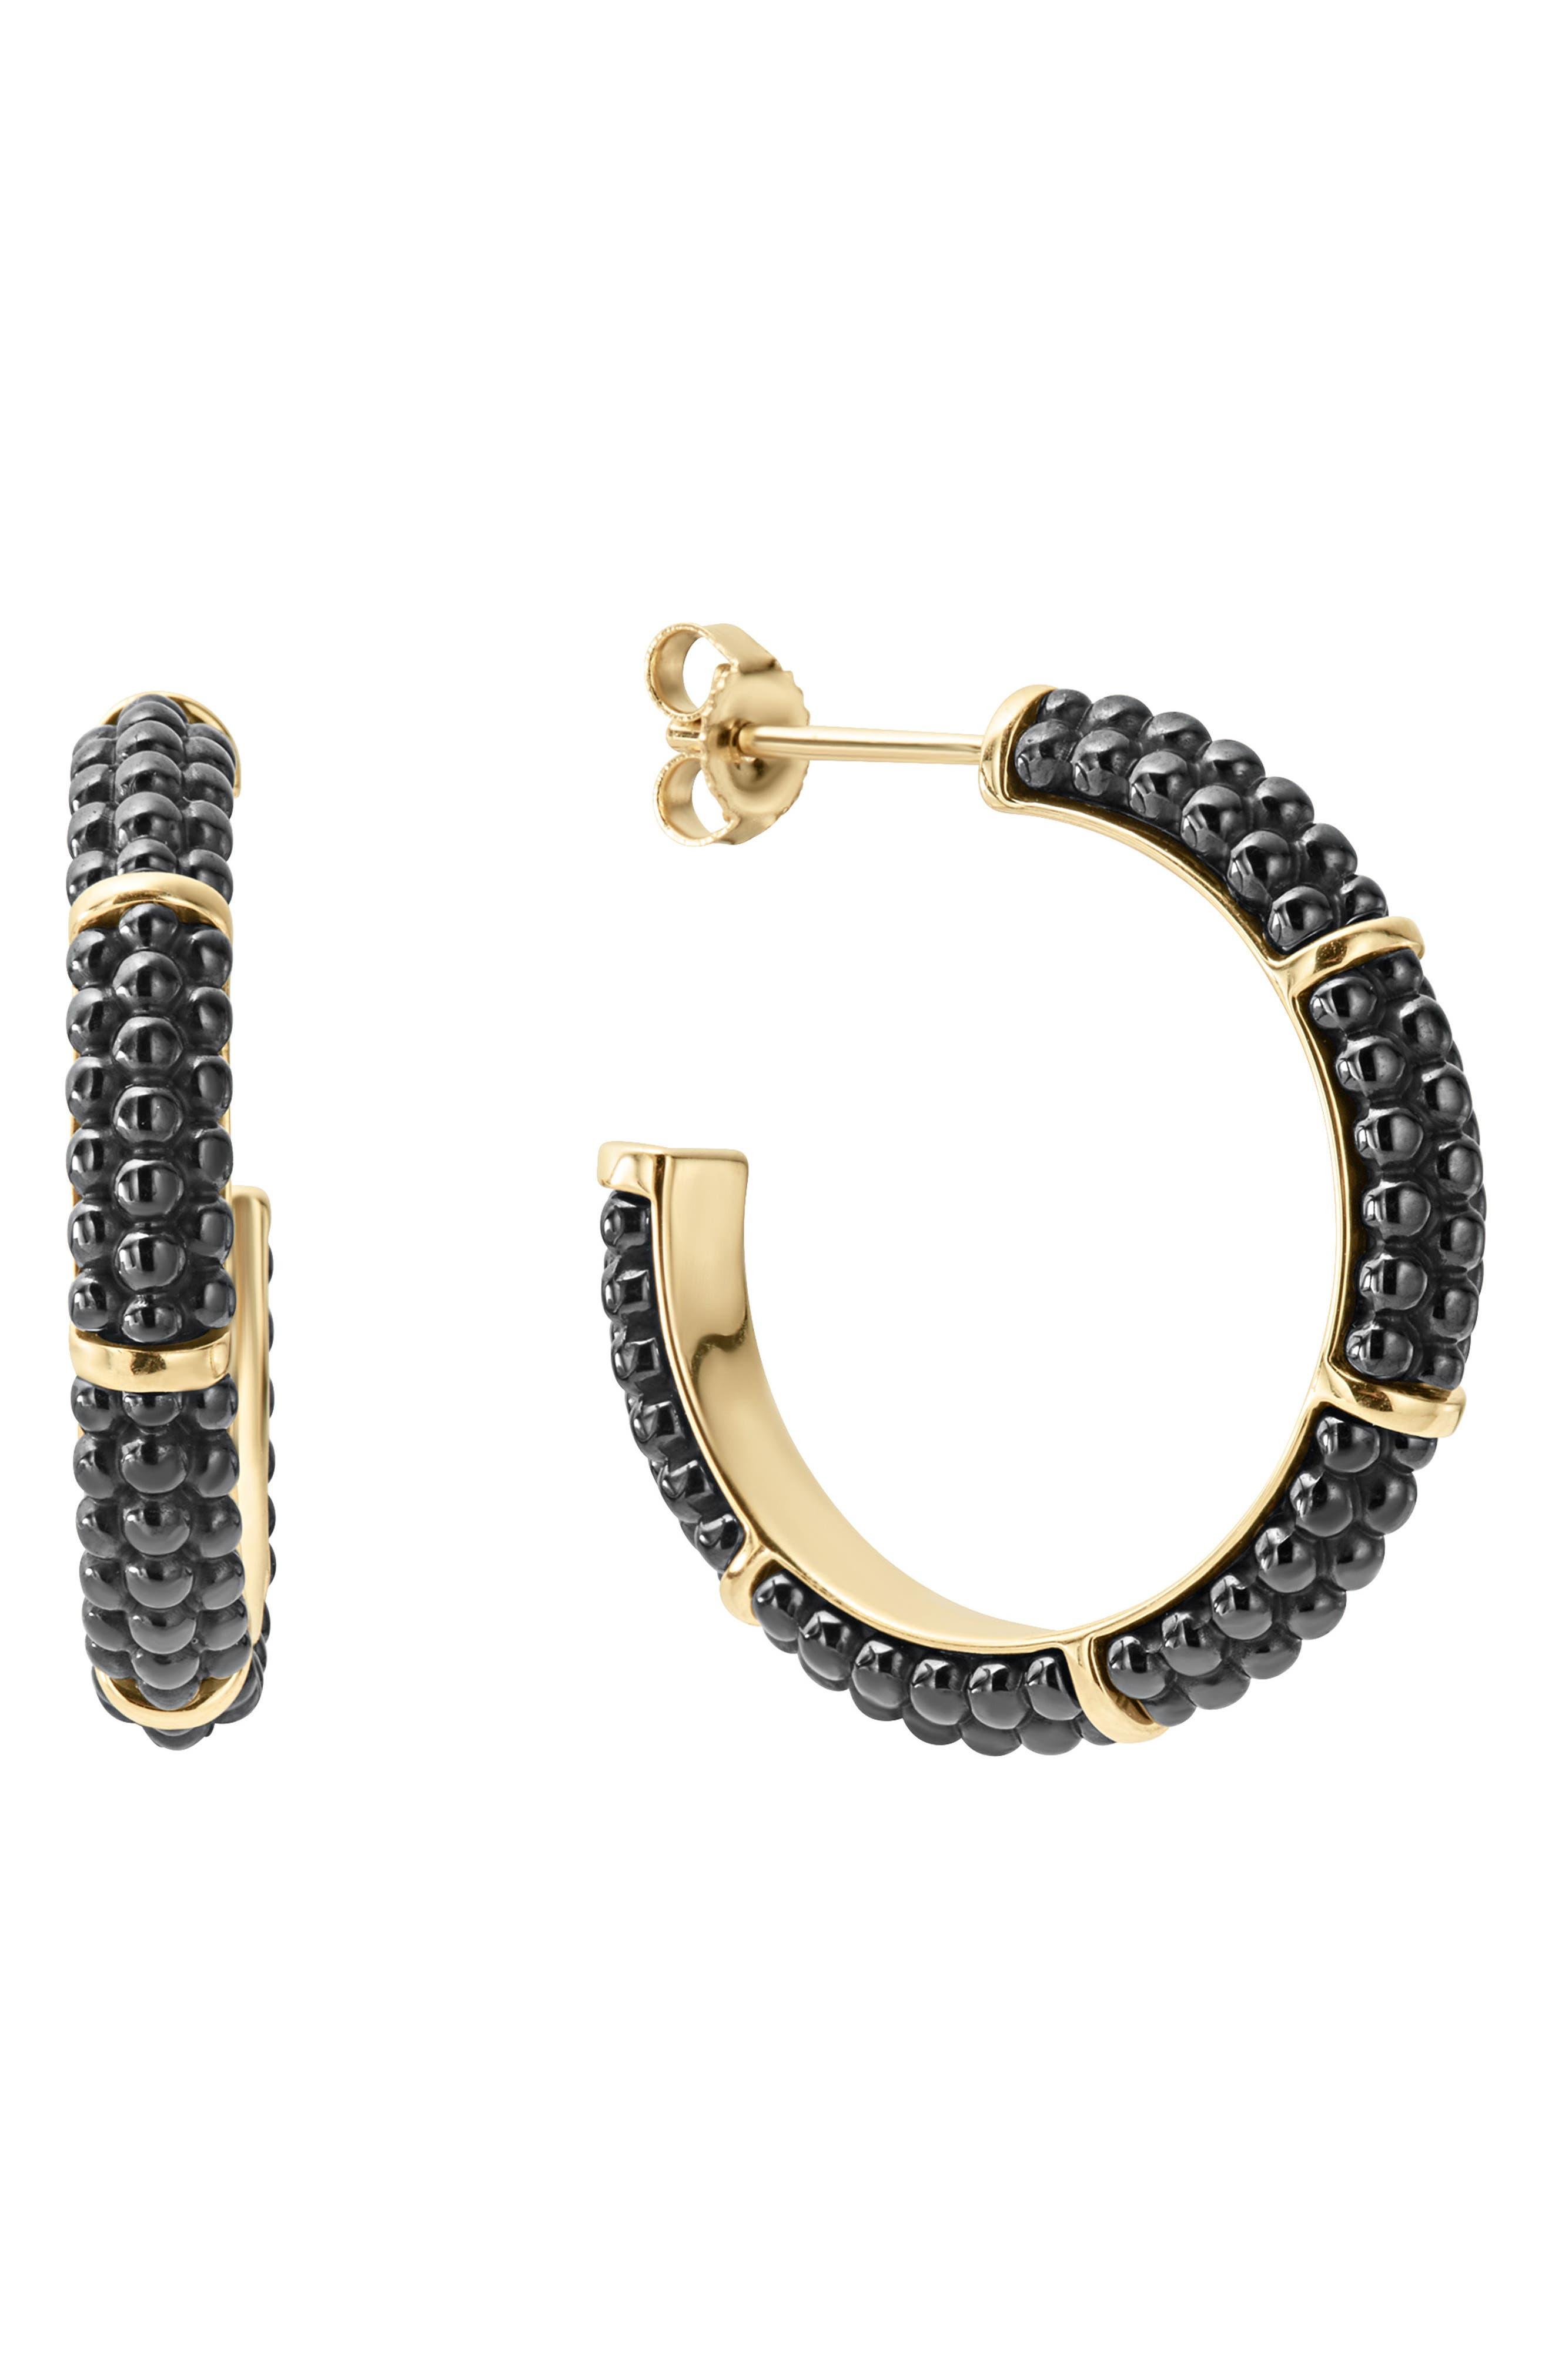 Gold & Black Caviar Hoop Earrings,                             Main thumbnail 1, color,                             Gold